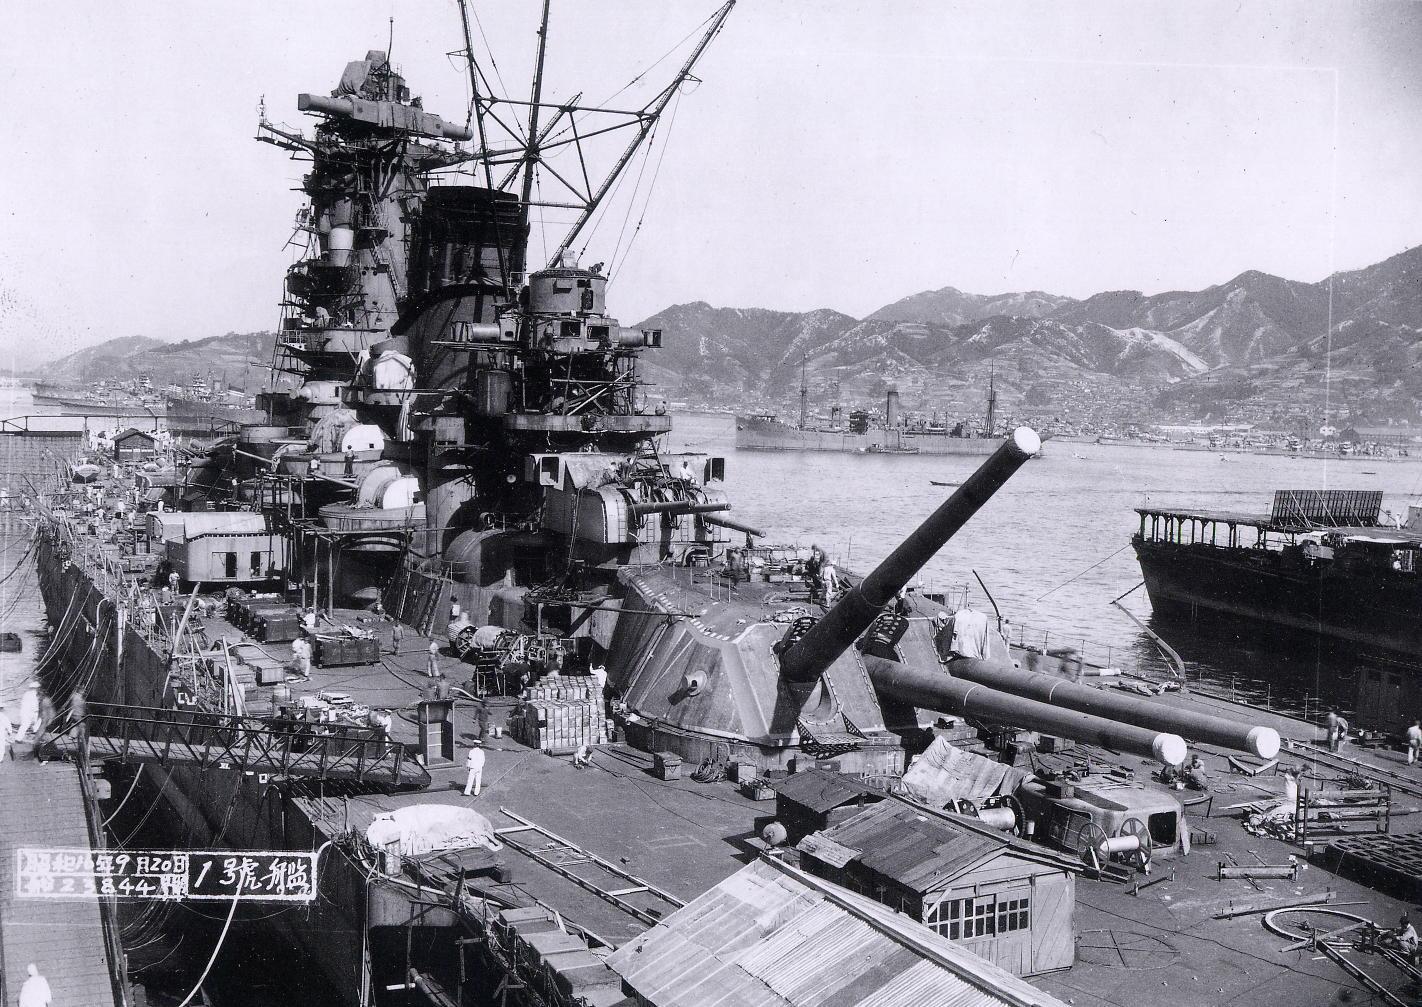 Yamato battleship under constructionjpg 1422x1007